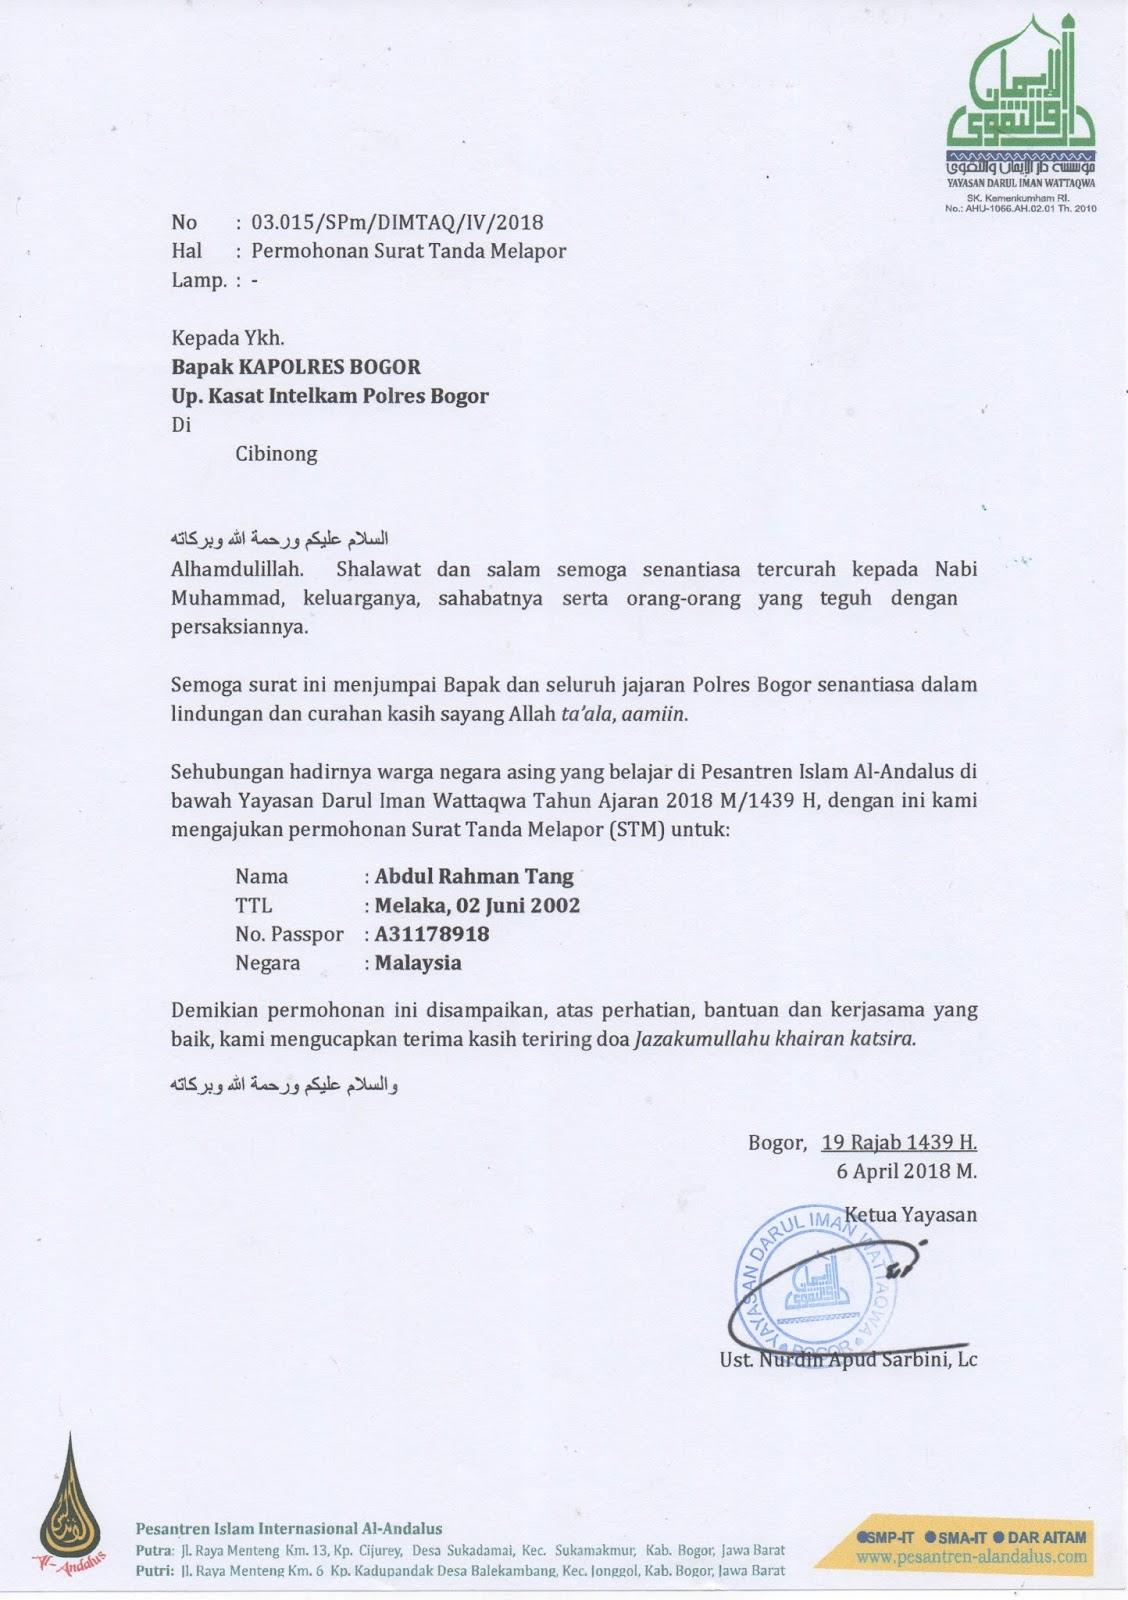 Contoh surat permohonan stm dari polres brankas arsip contoh surat permohonan stm altavistaventures Choice Image